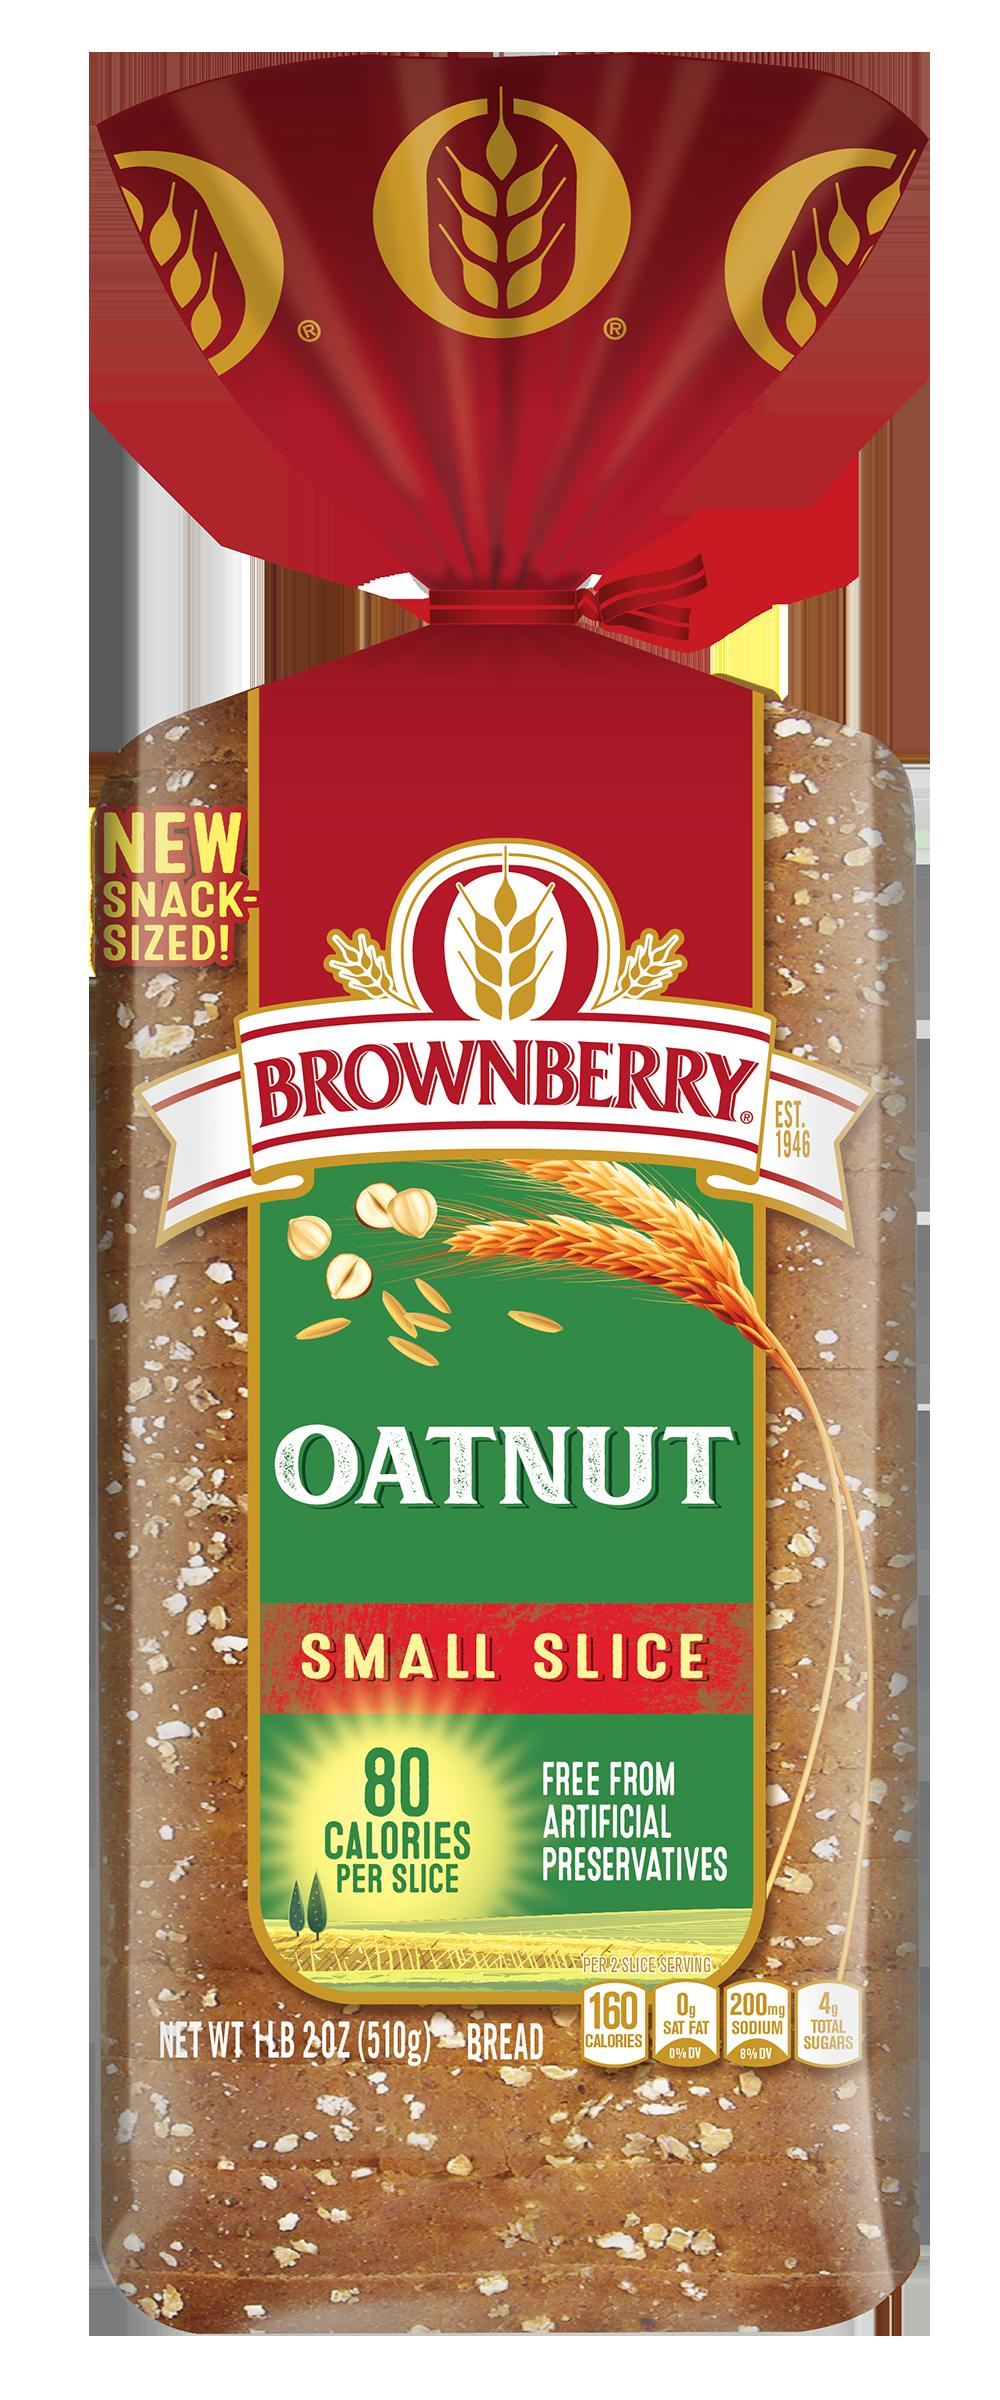 Brownberry Small Slice Oatnut 18oz Packaging